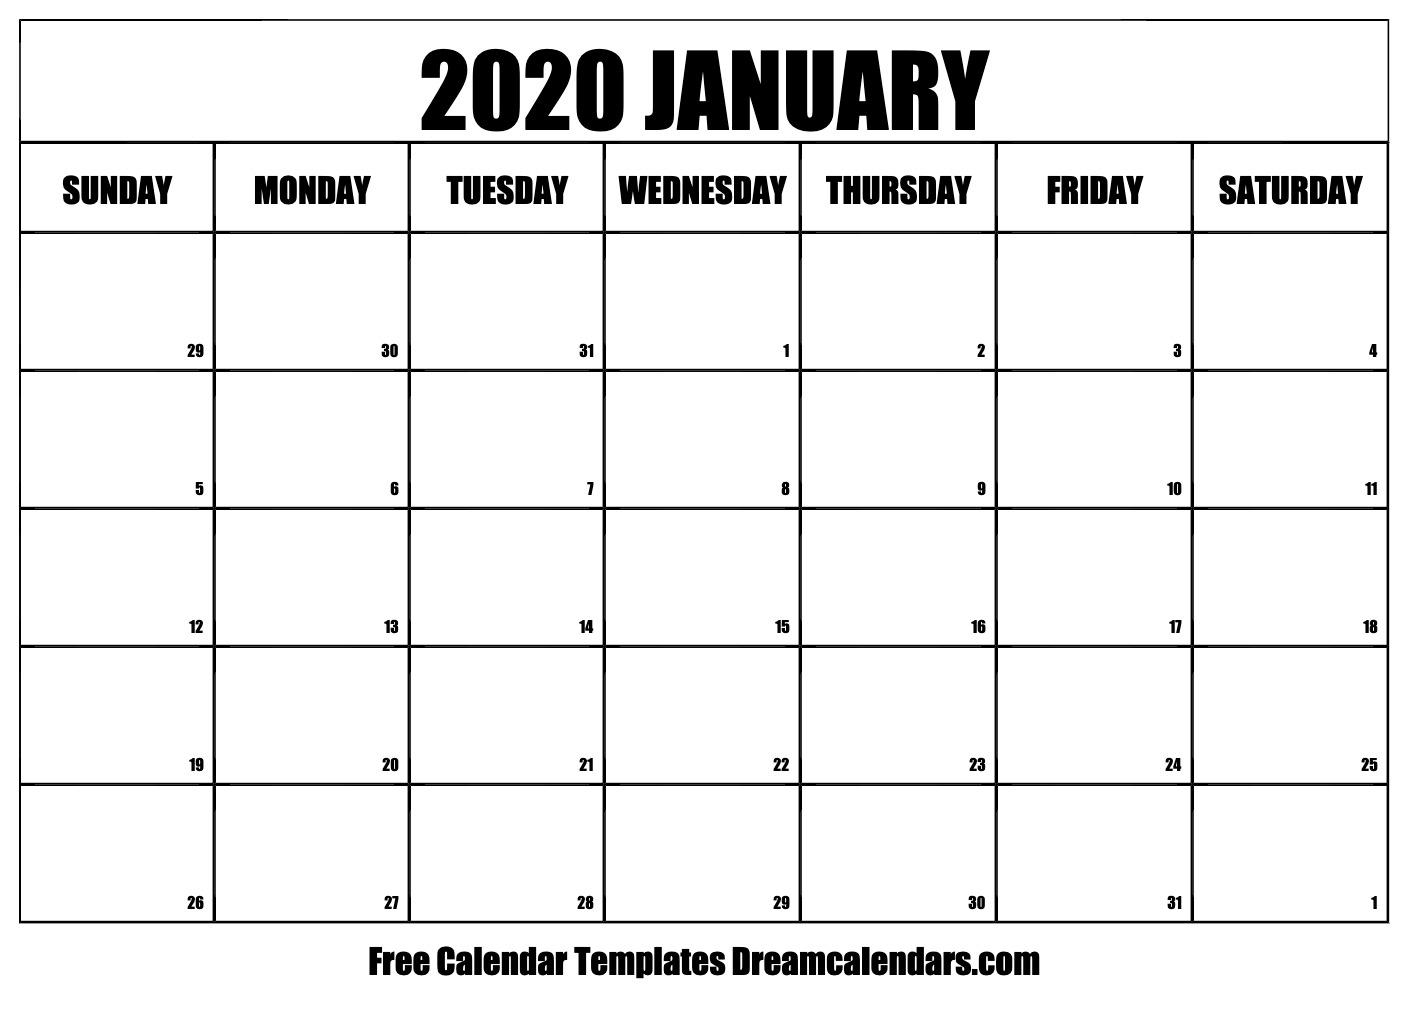 Free January 2020 Printable Calendar | Dream Calendars